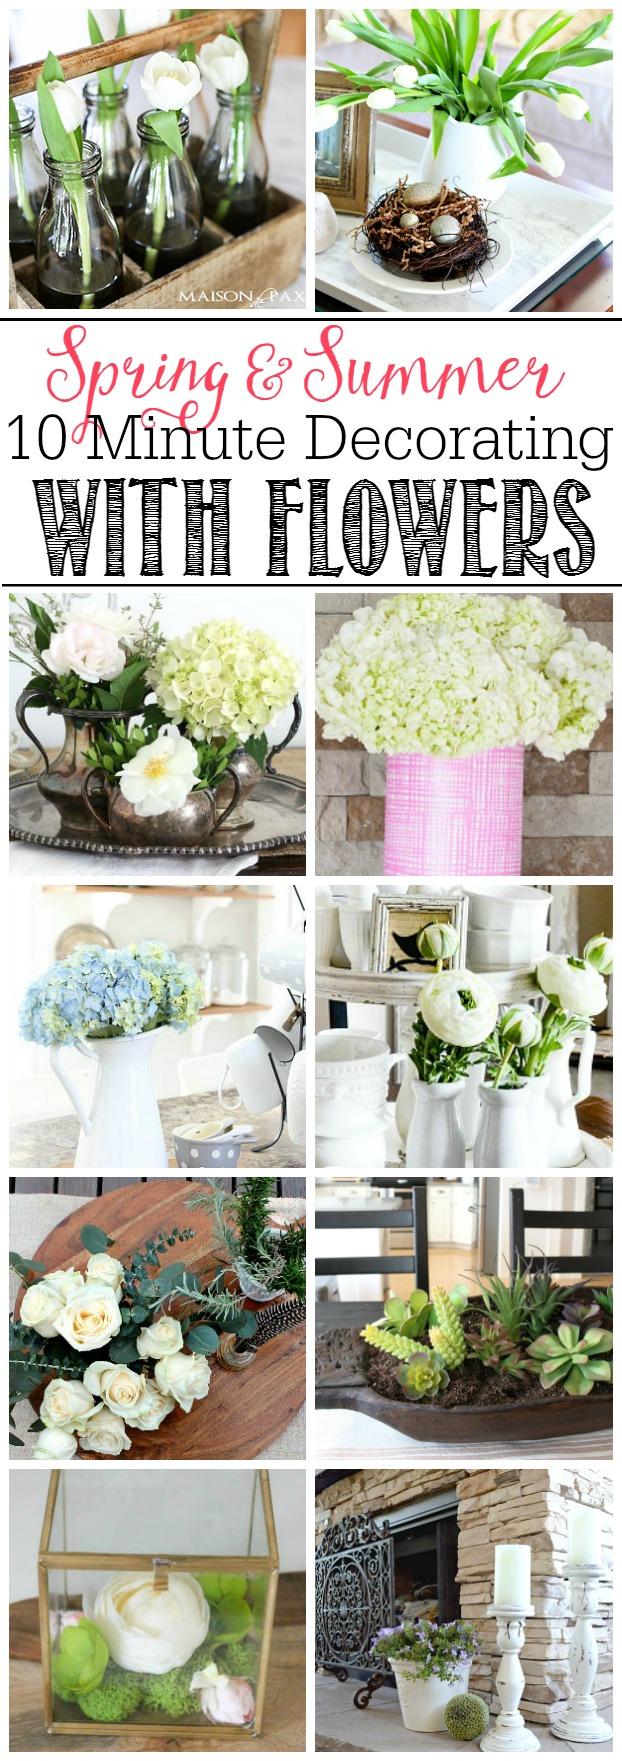 Decorating with Flowers kellyelko.com